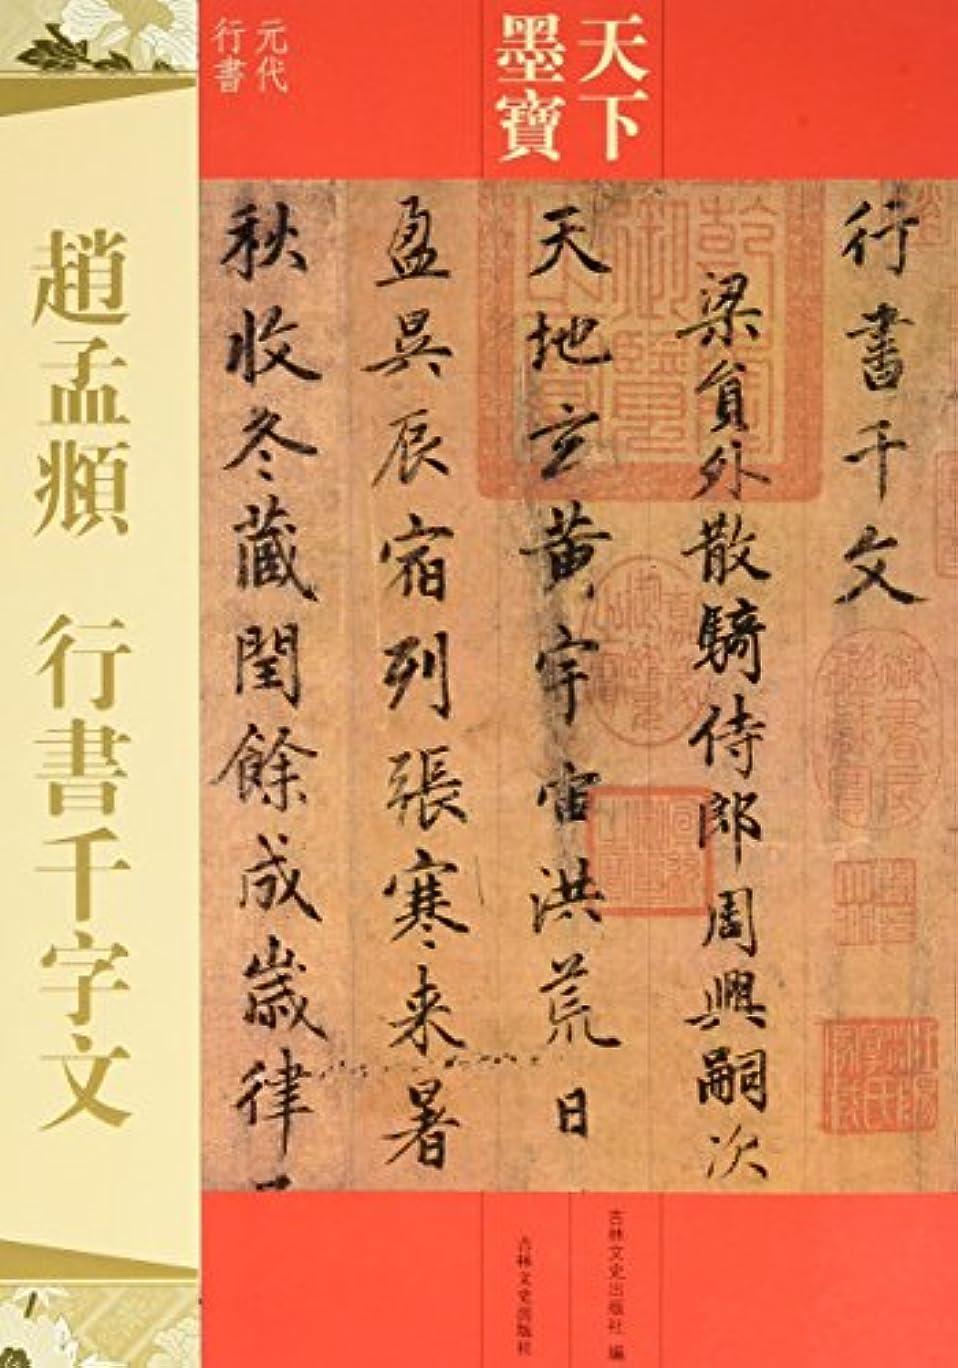 審判重量提供する天下墨宝 趙孟頫行書千字文